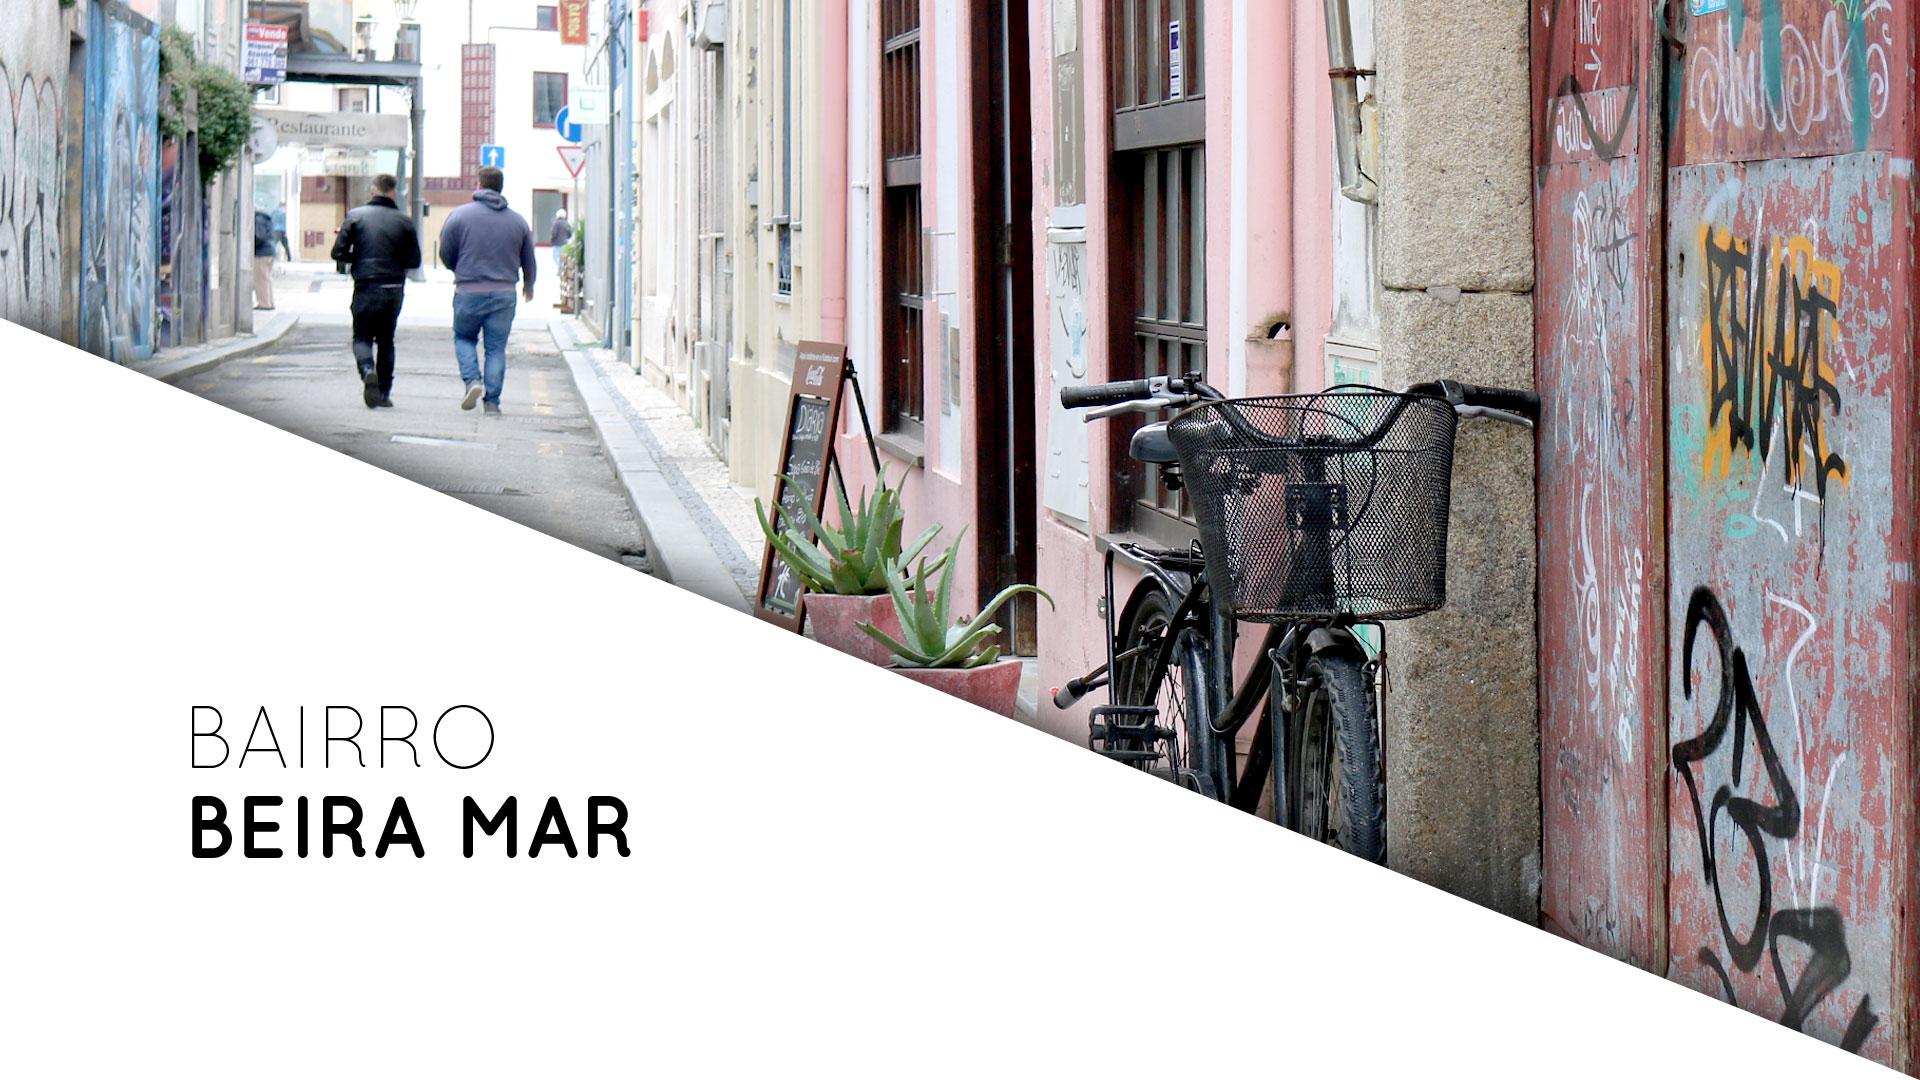 Beira-mar-Aveiro-ville-real-estate-imobiliaria-comprar-arrendar-vender-moradia-apartamento-casa-t0-t1-t2-t3-t4-capa-2